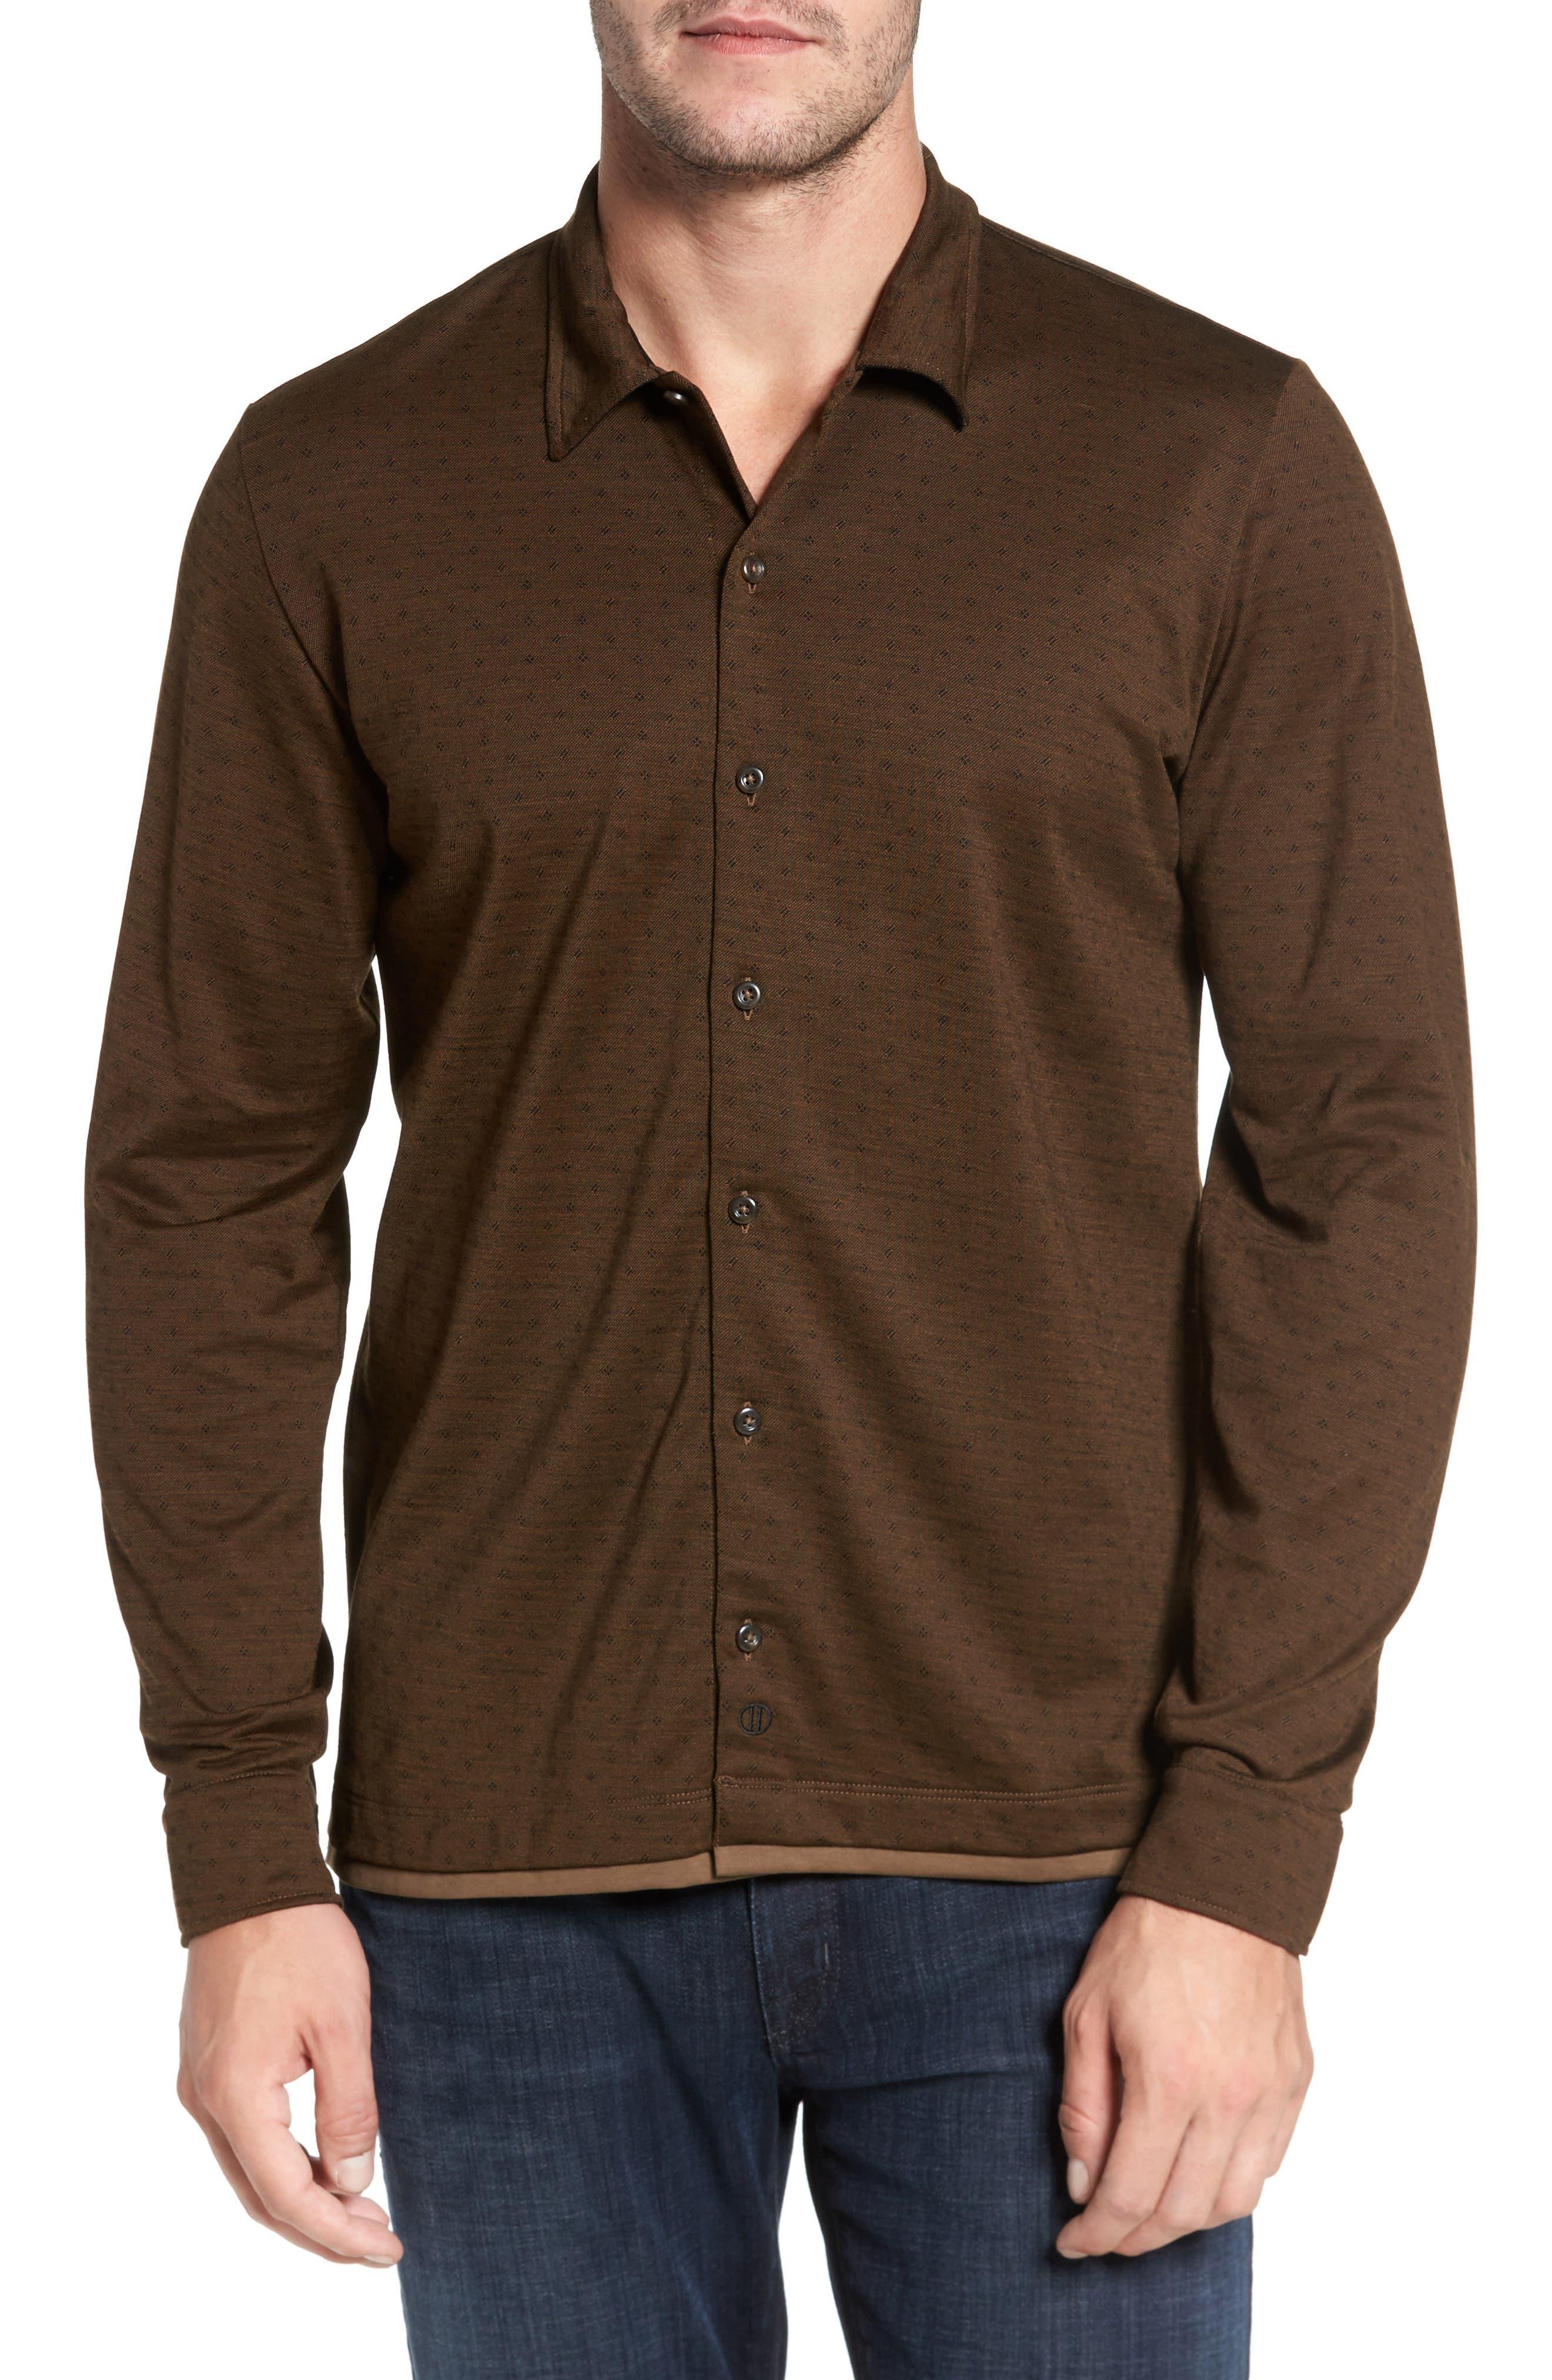 Alternate Image 1 Selected - David Donahue Jacquard Knit Sport Shirt